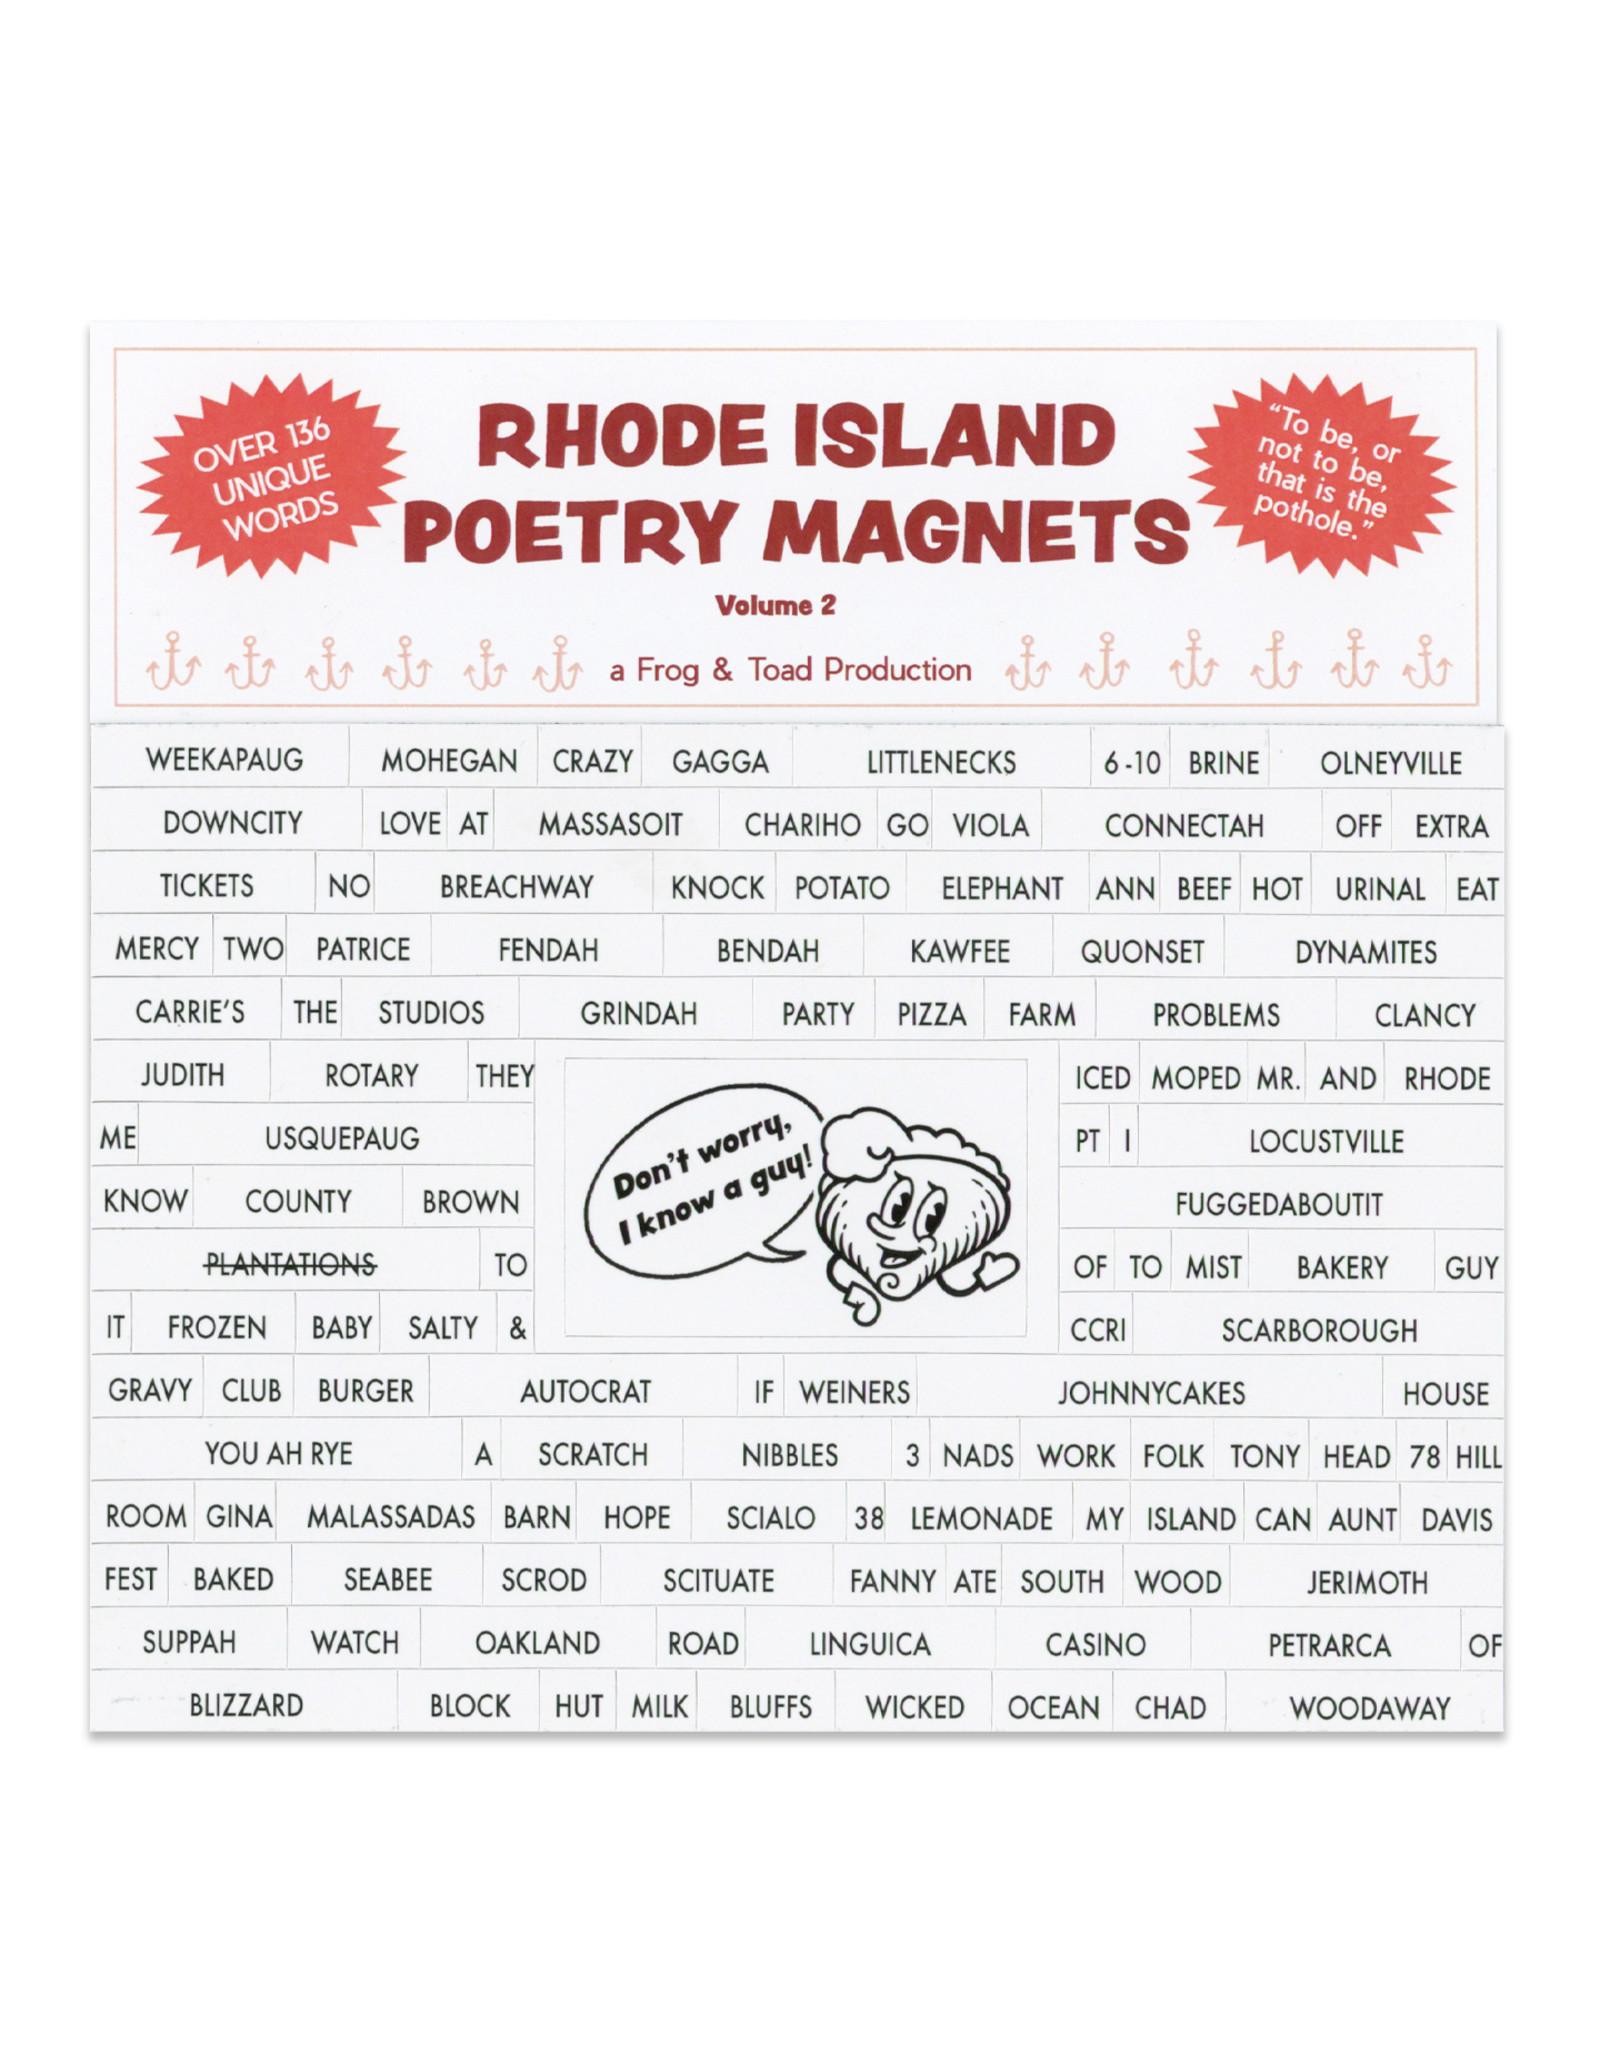 Rhode Island Poetry Magnets Vol 2.